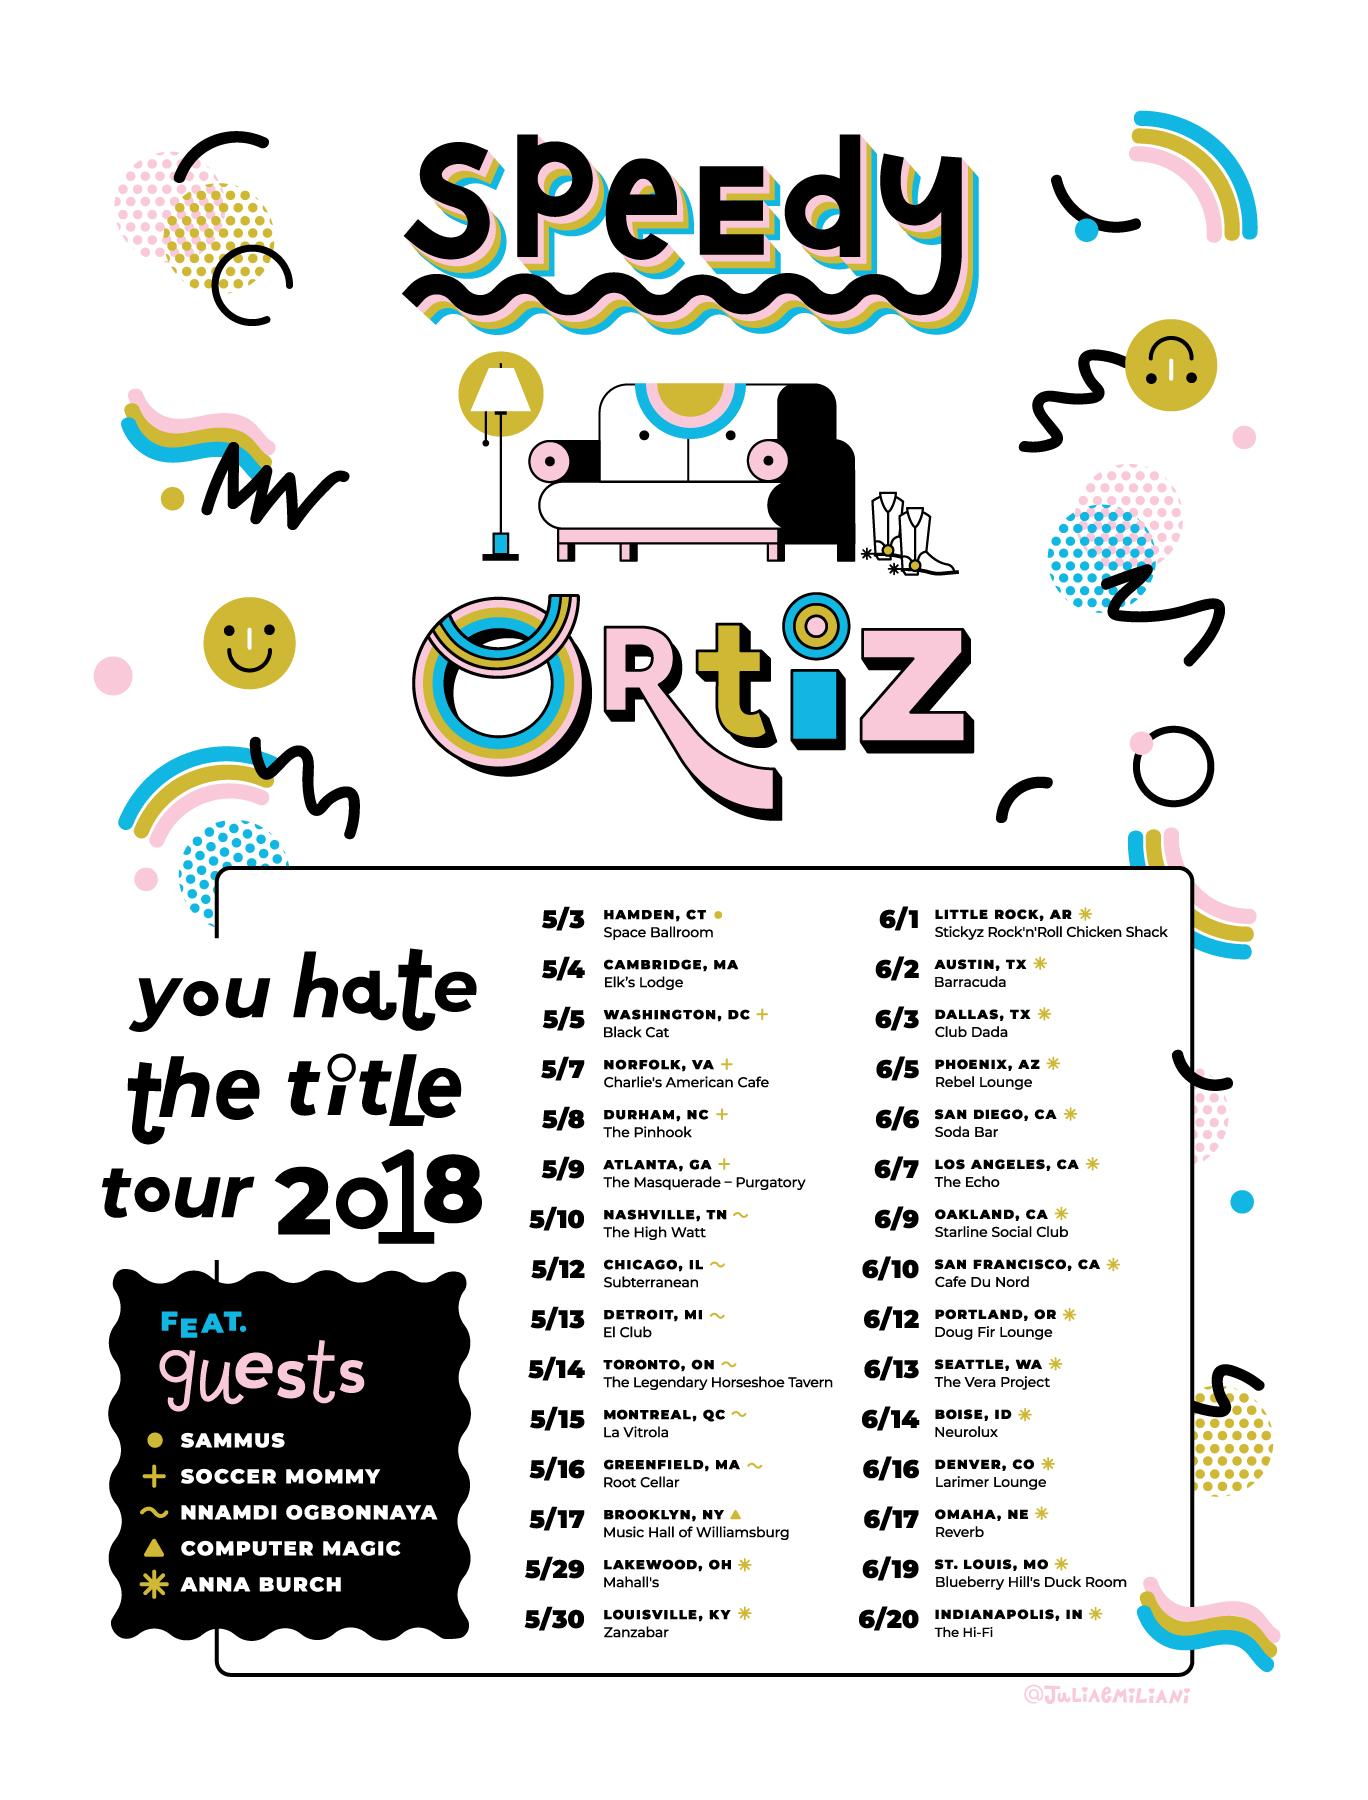 Speedy Ortiz - Poster - Final - lowres.jpg